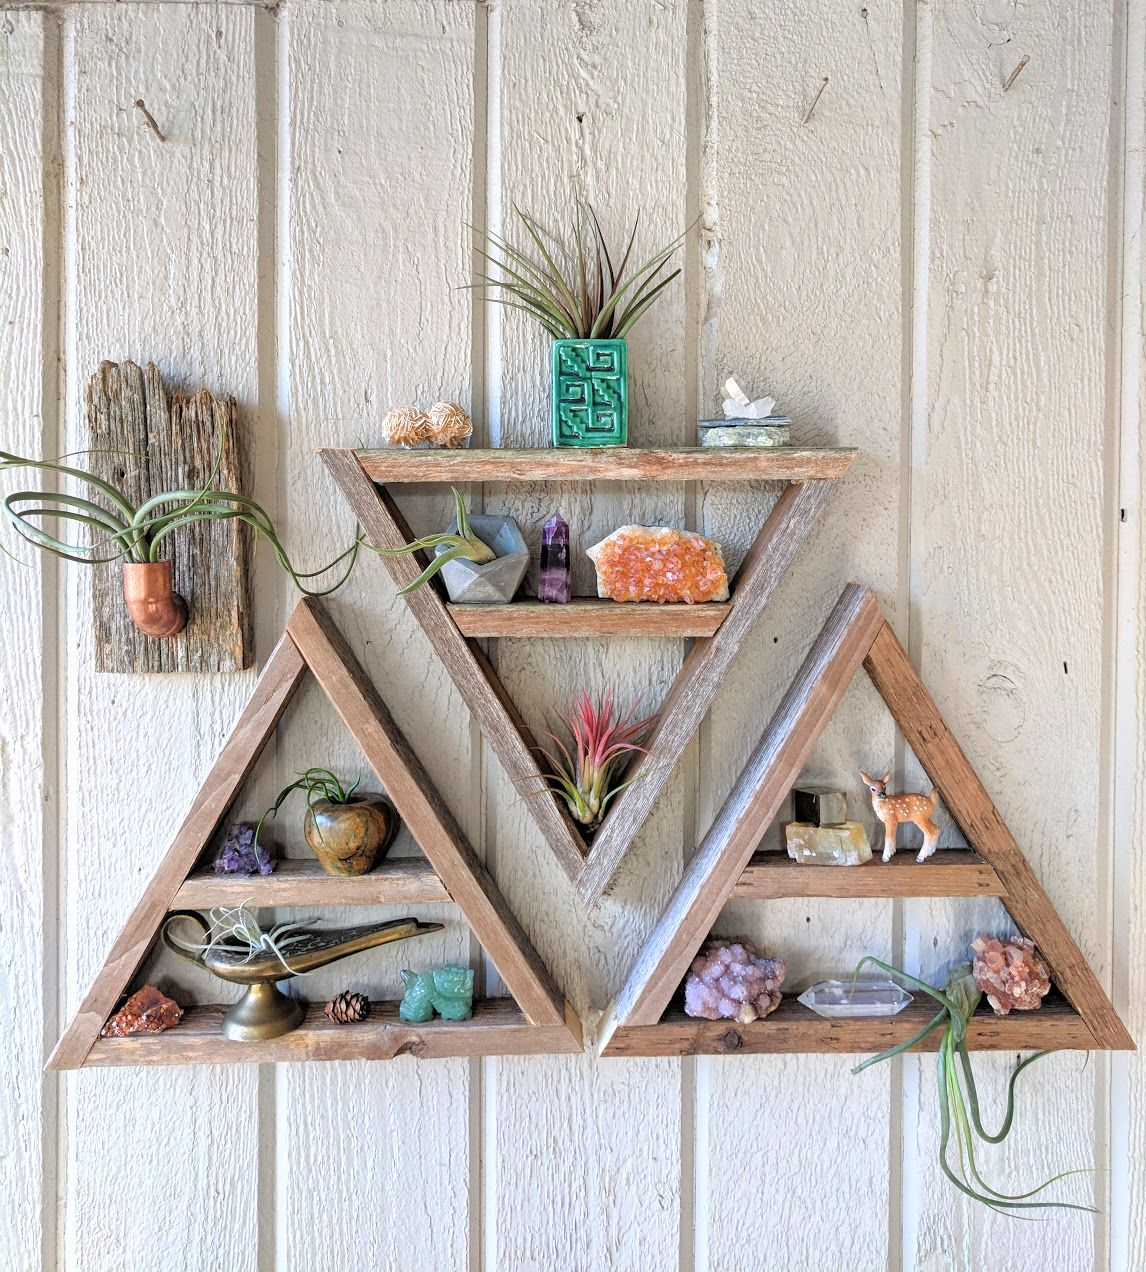 Three Triangle Shelves Geometric Wood Art Crystal Display